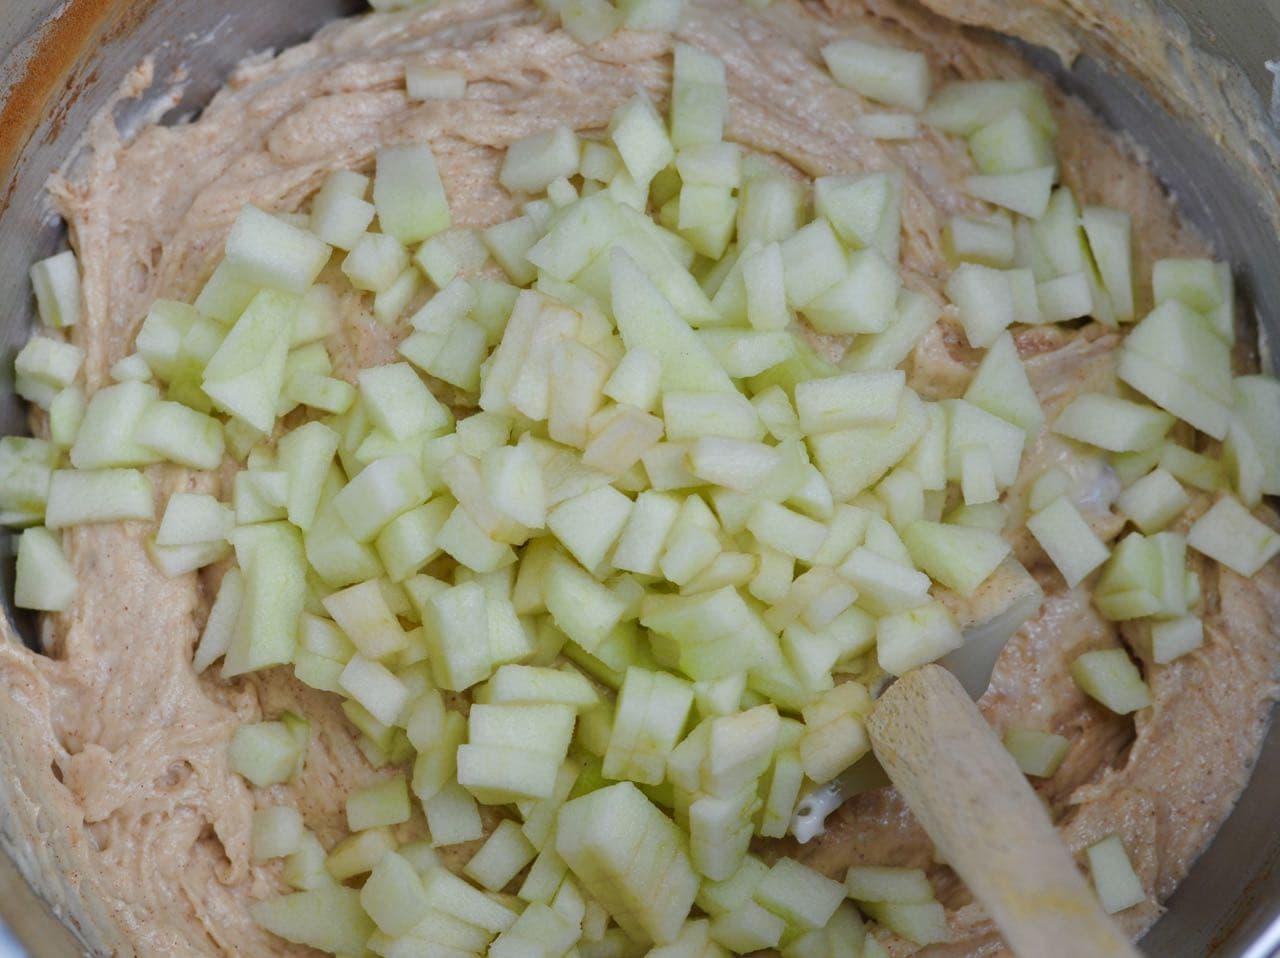 Apple Cinnamon Sour Cream Coffee Cake